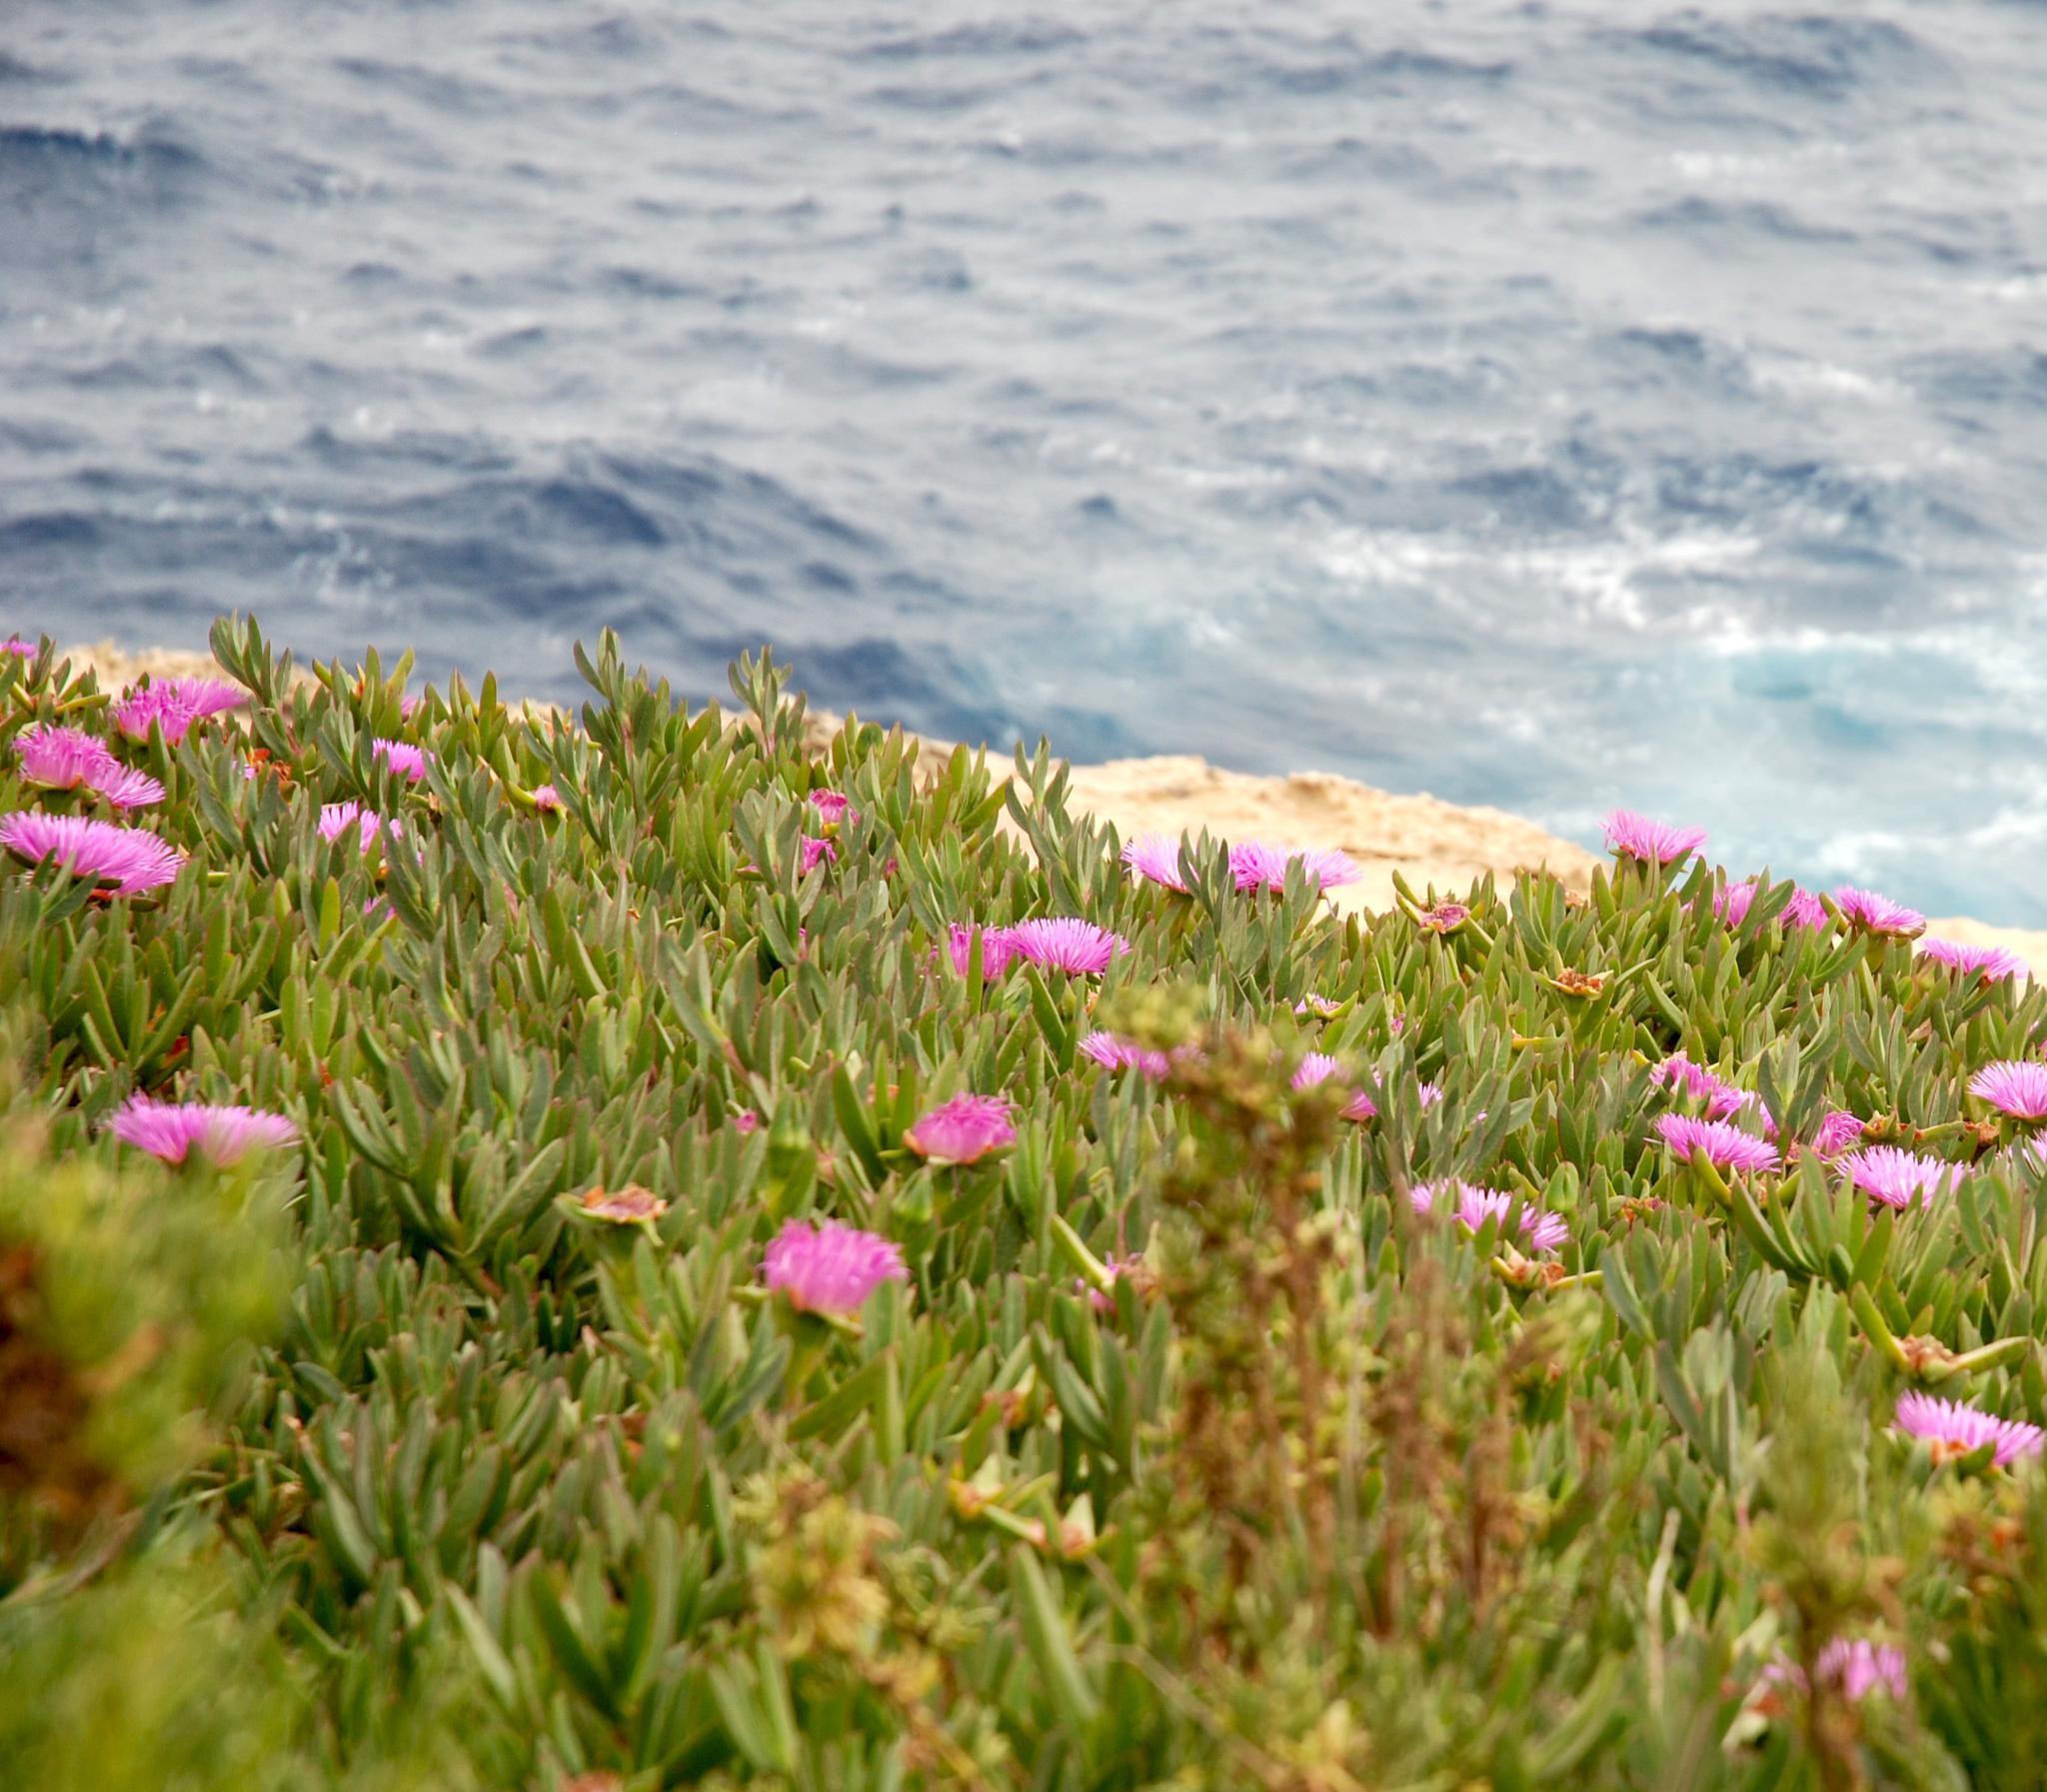 Malta flowers by leena.ekroth